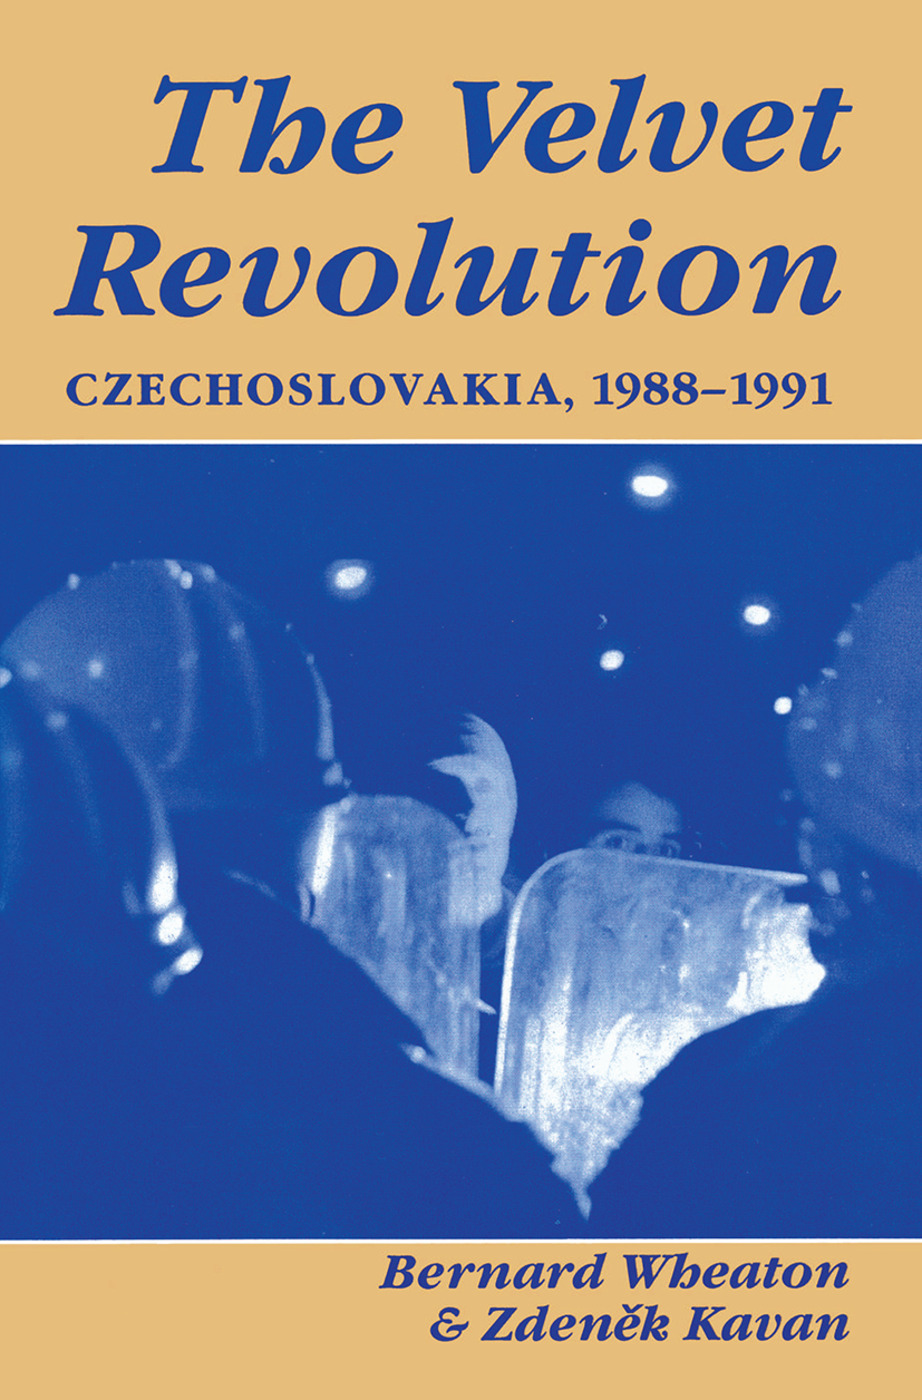 The Velvet Revolution: Czechoslovakia, 1988-1991, 1st Edition (Hardback) book cover